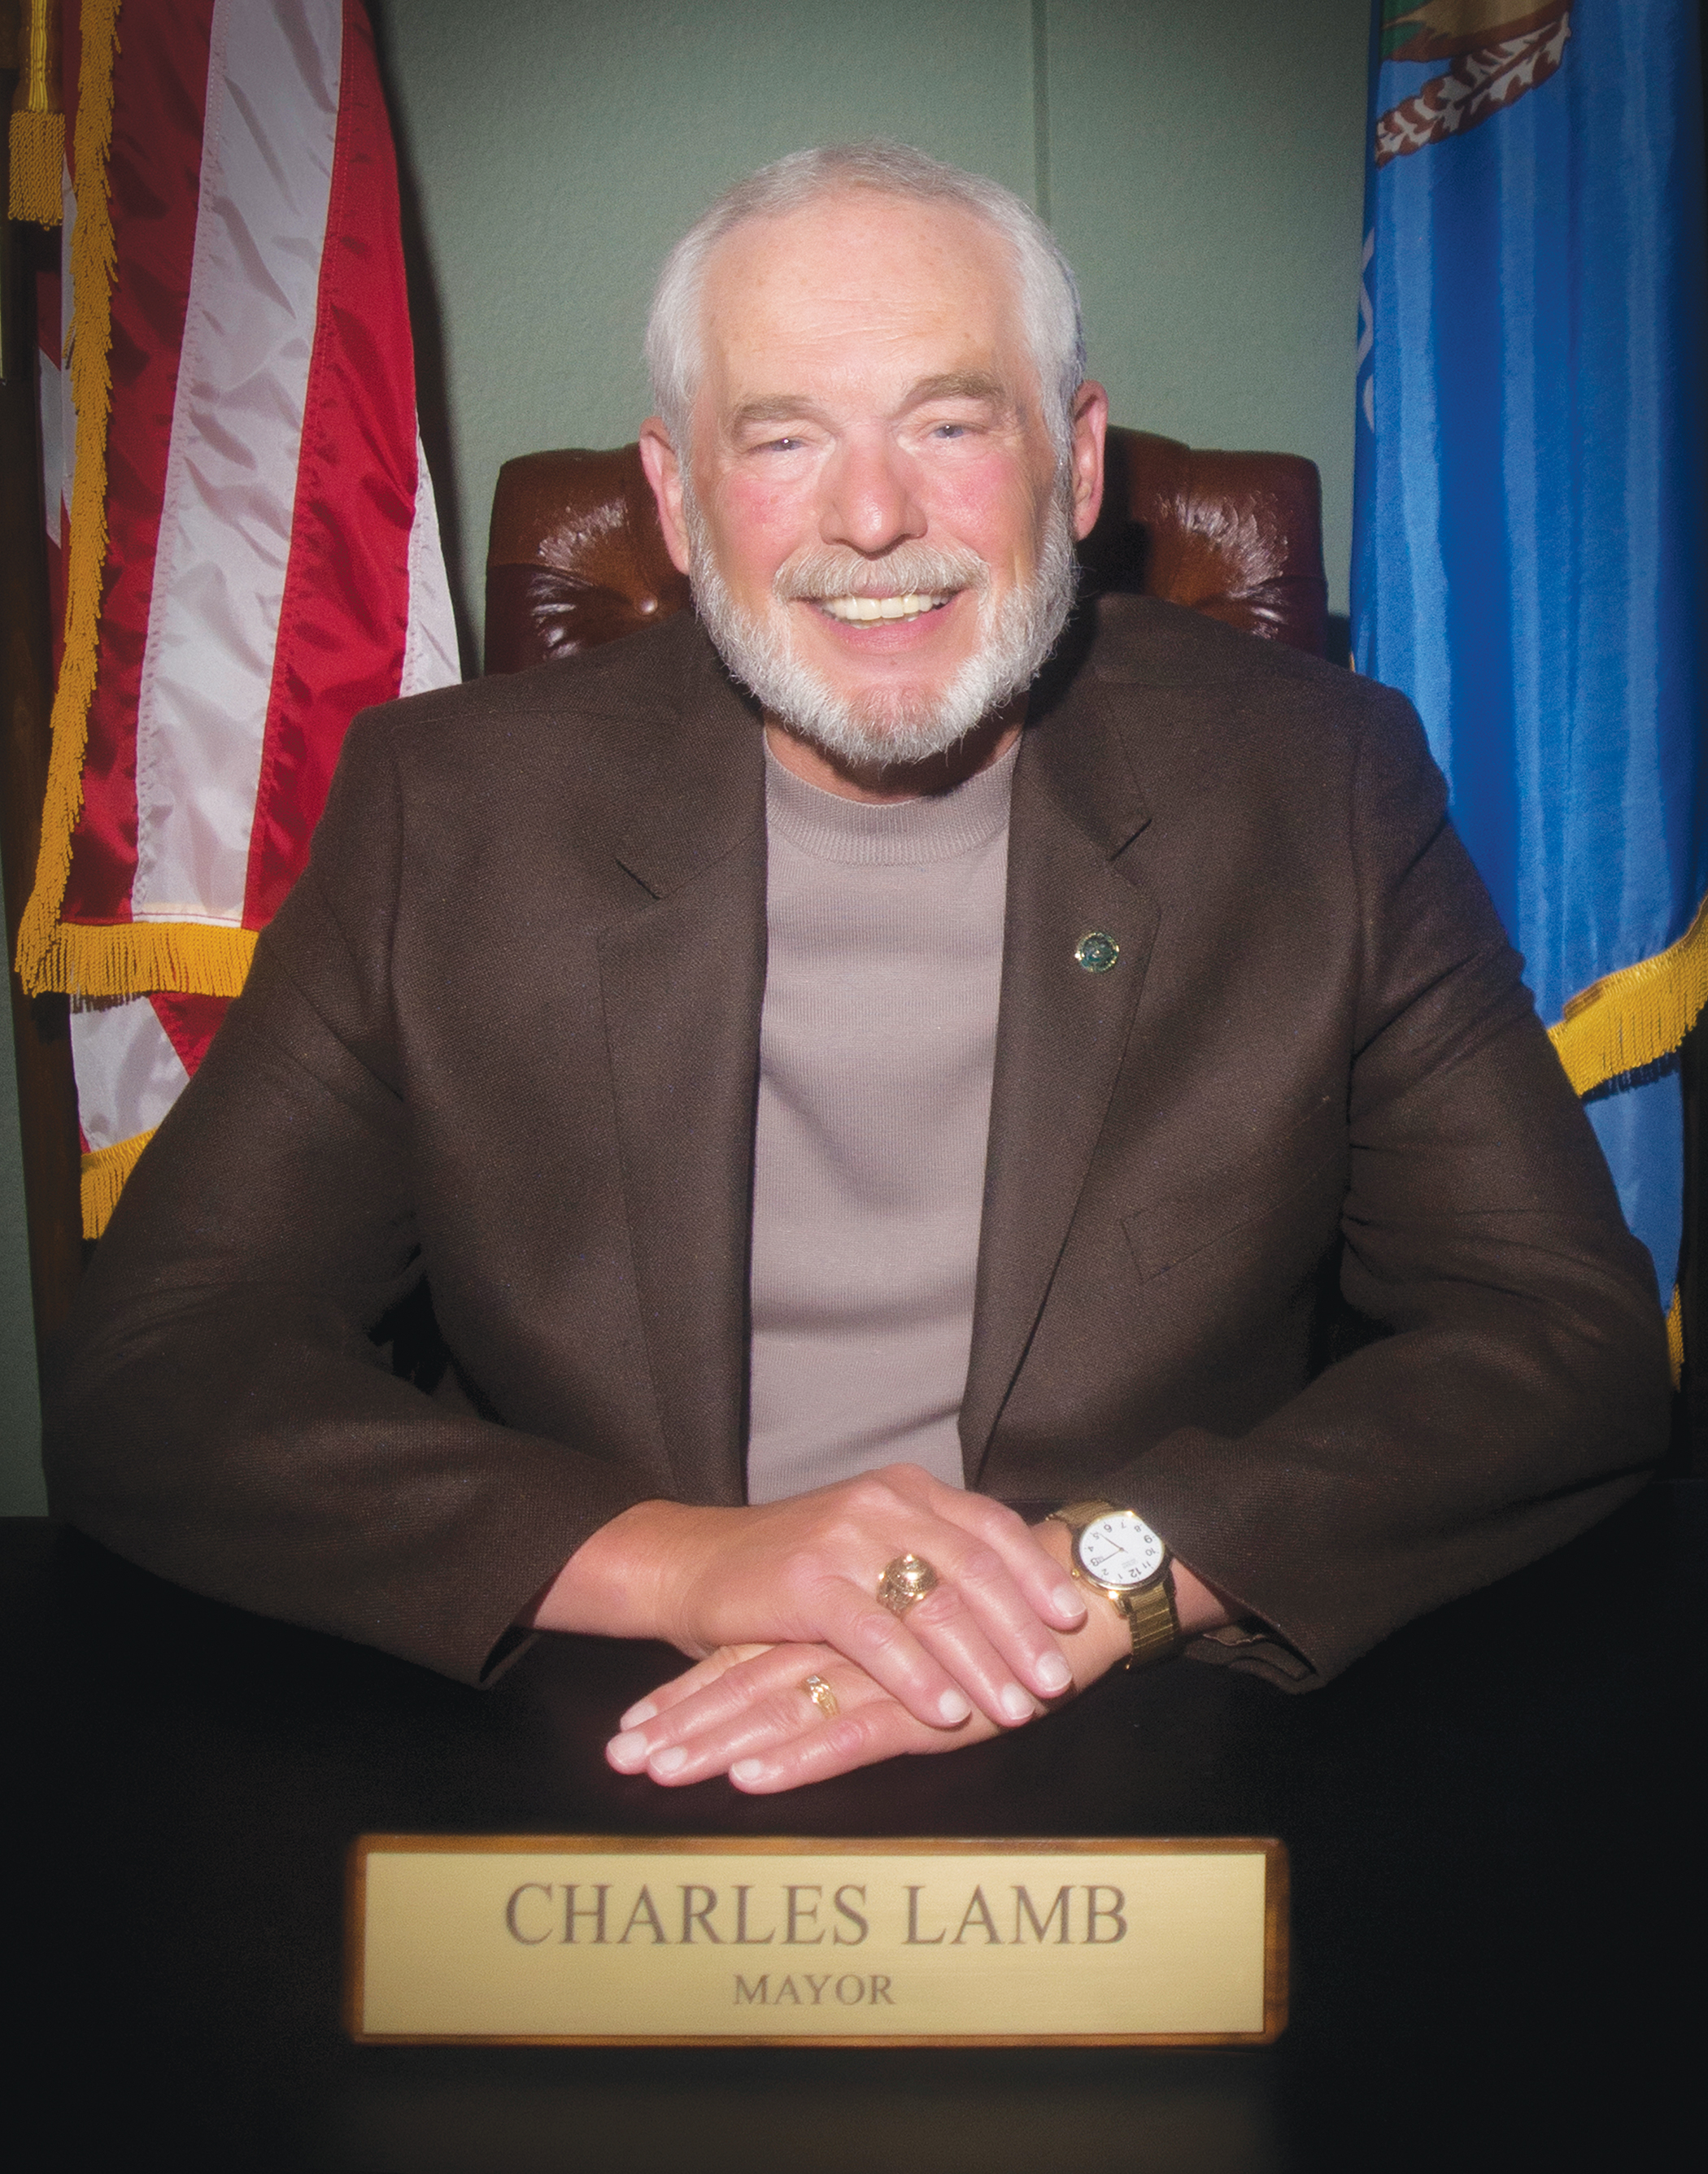 Charles Lamb the Shepherd of Edmond